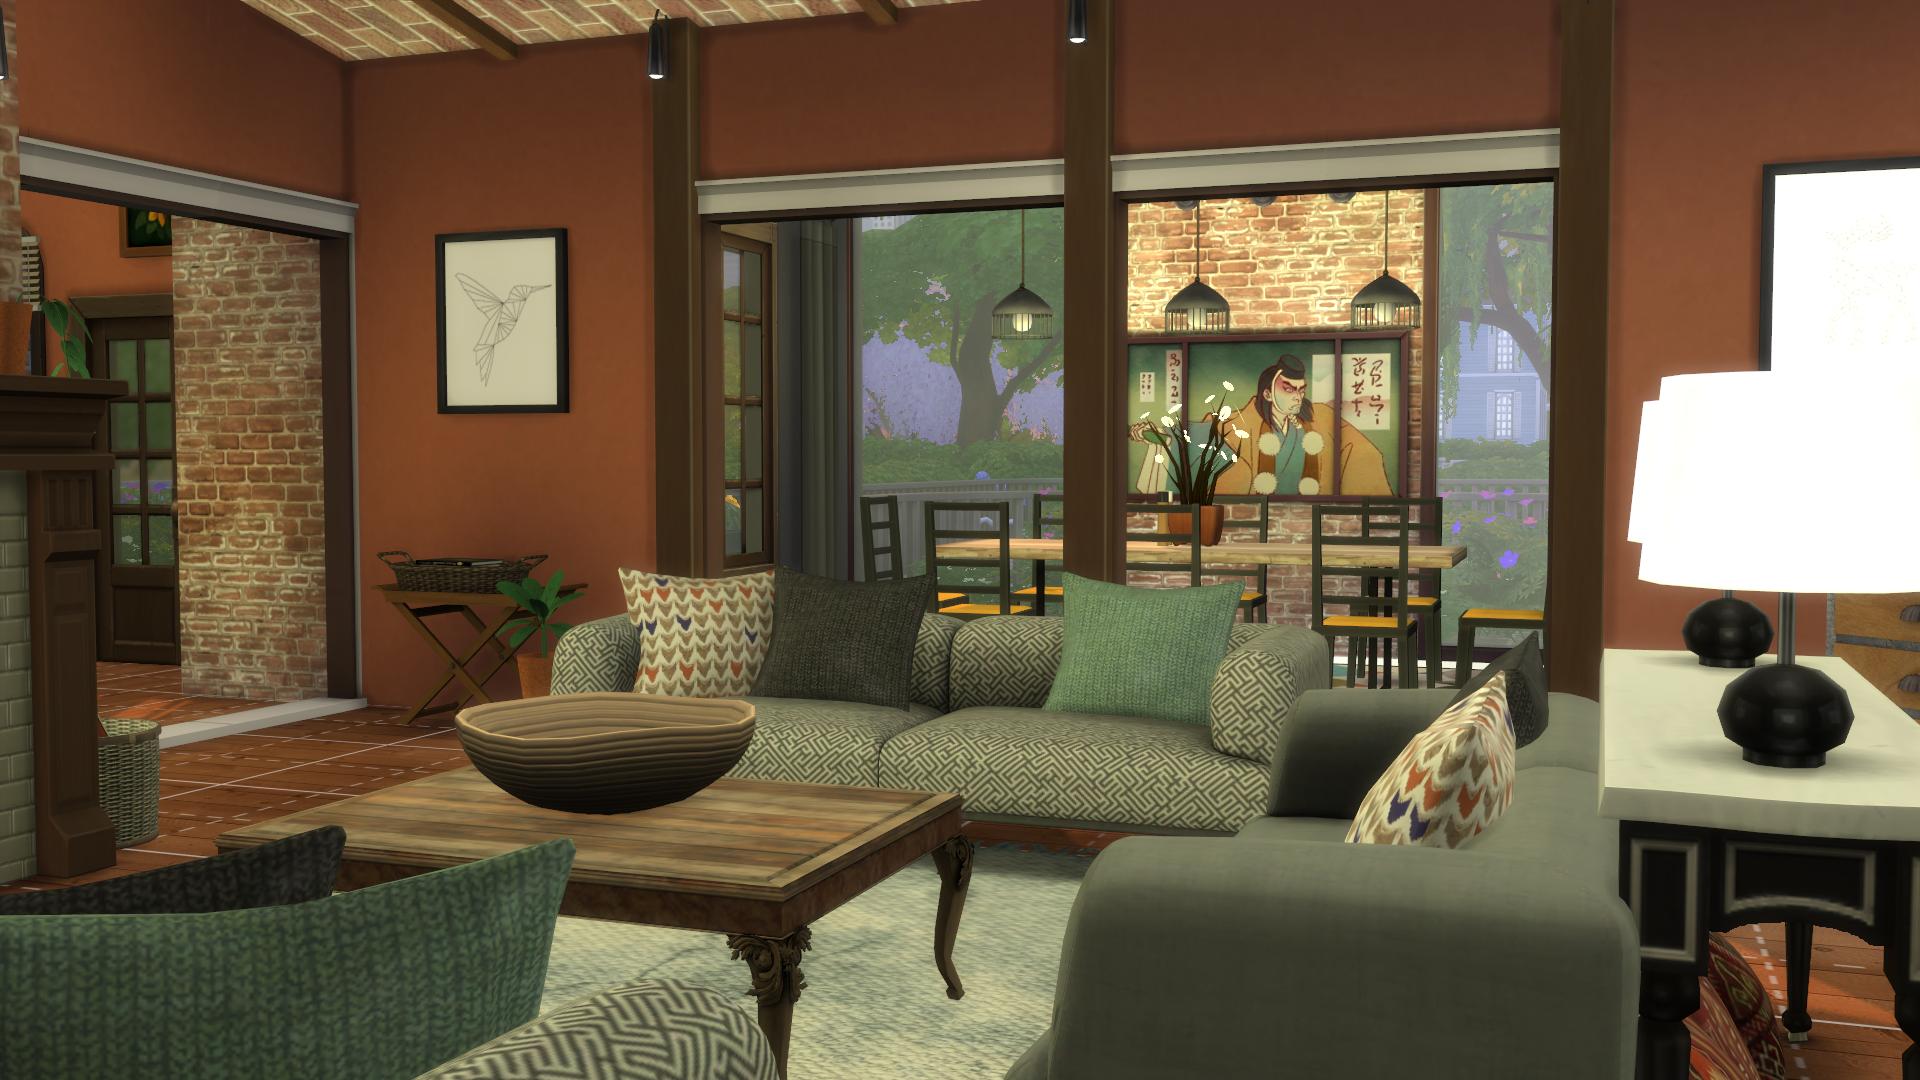 Sims 4 CC | Home decor, Home, Decor